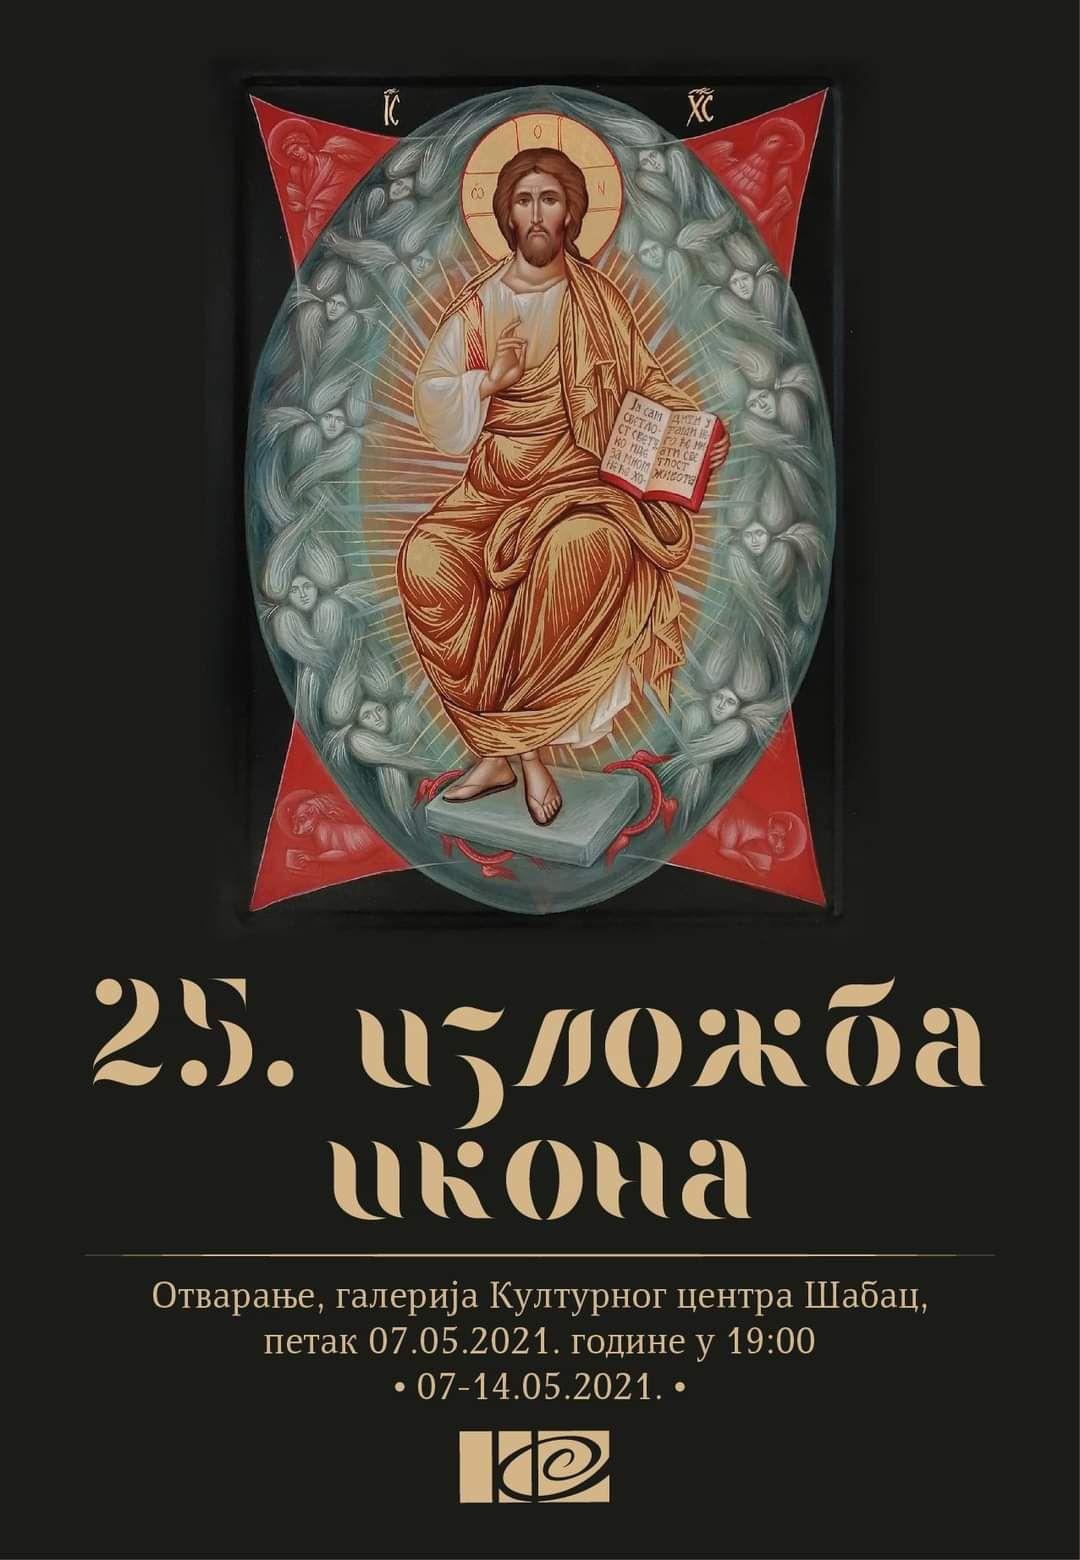 Изложба икона у Културном центру